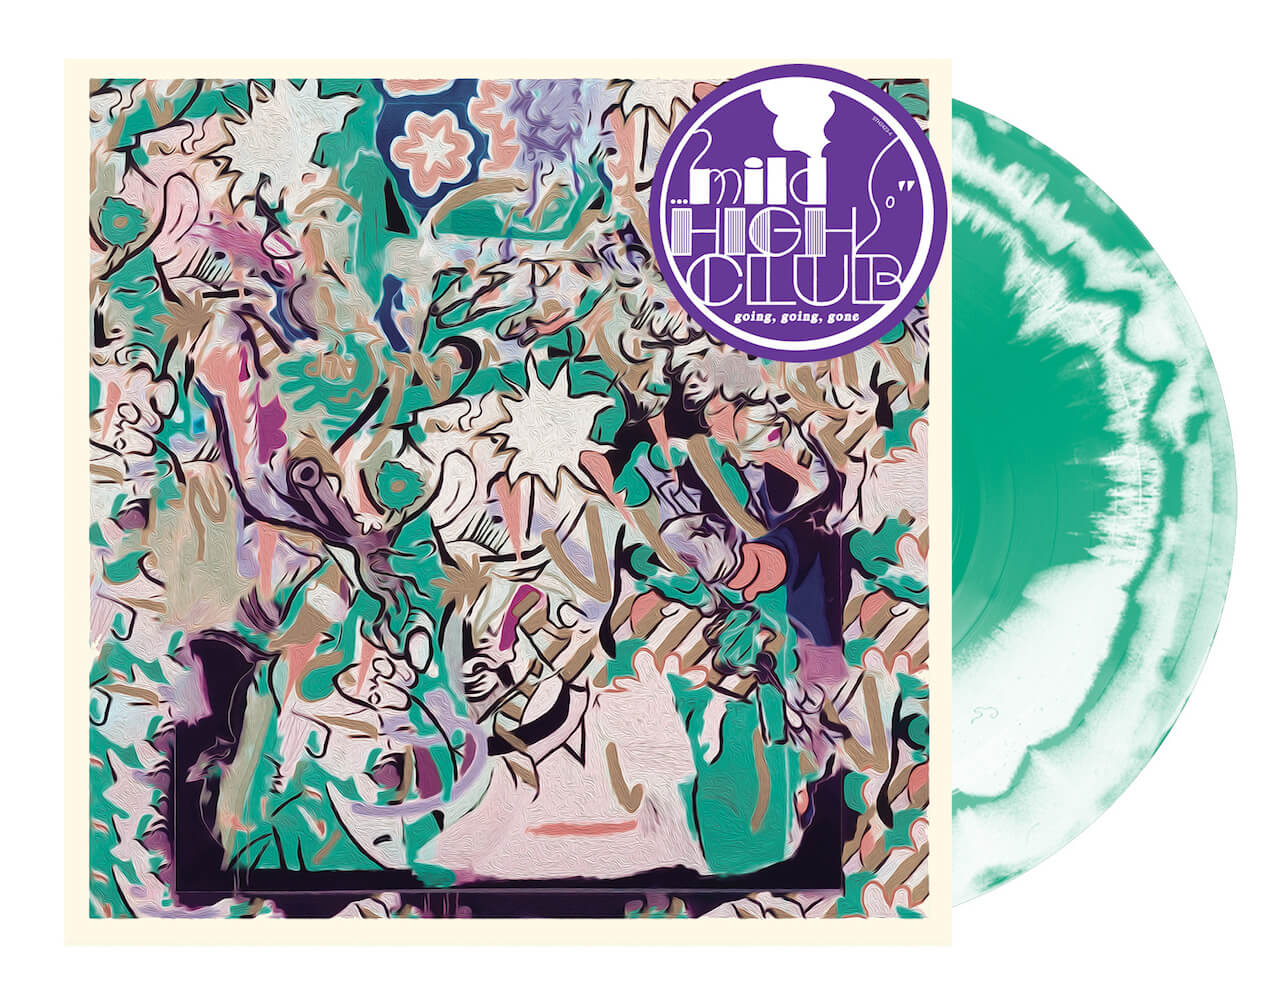 Mild High Clubの最新作『Going Going Gone』が〈Stones Throw〉からリリース music210917-mildhighclub-goinggoinggone-1